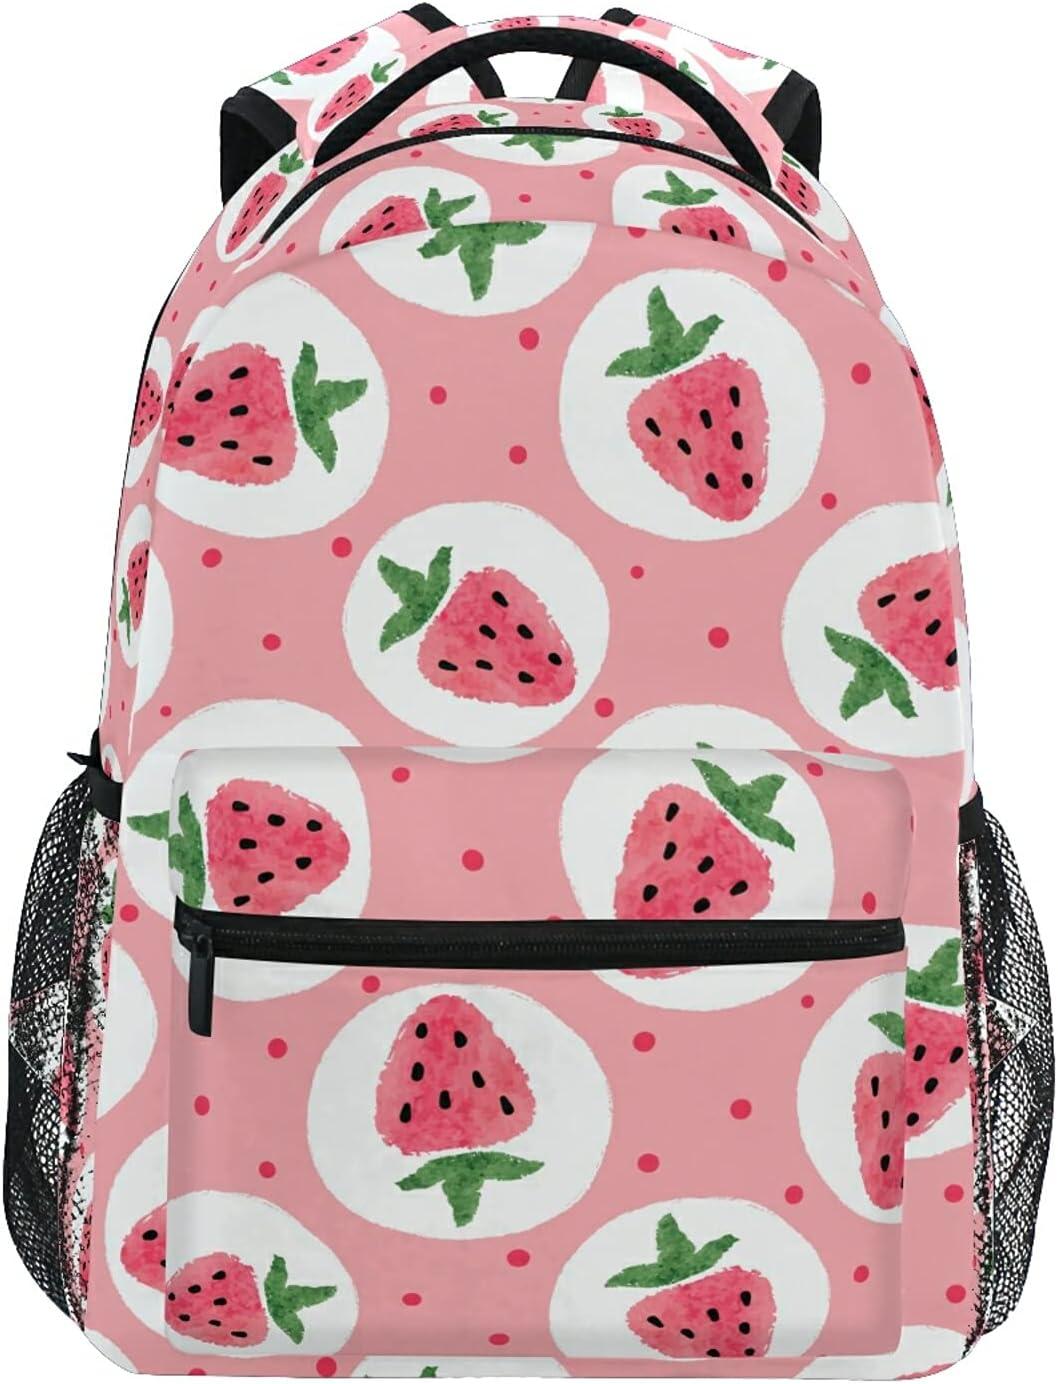 UWLIFE Dealing full price reduction Fruit Strawberry Polka Dot School Backpack K Popular product for Boy Girl